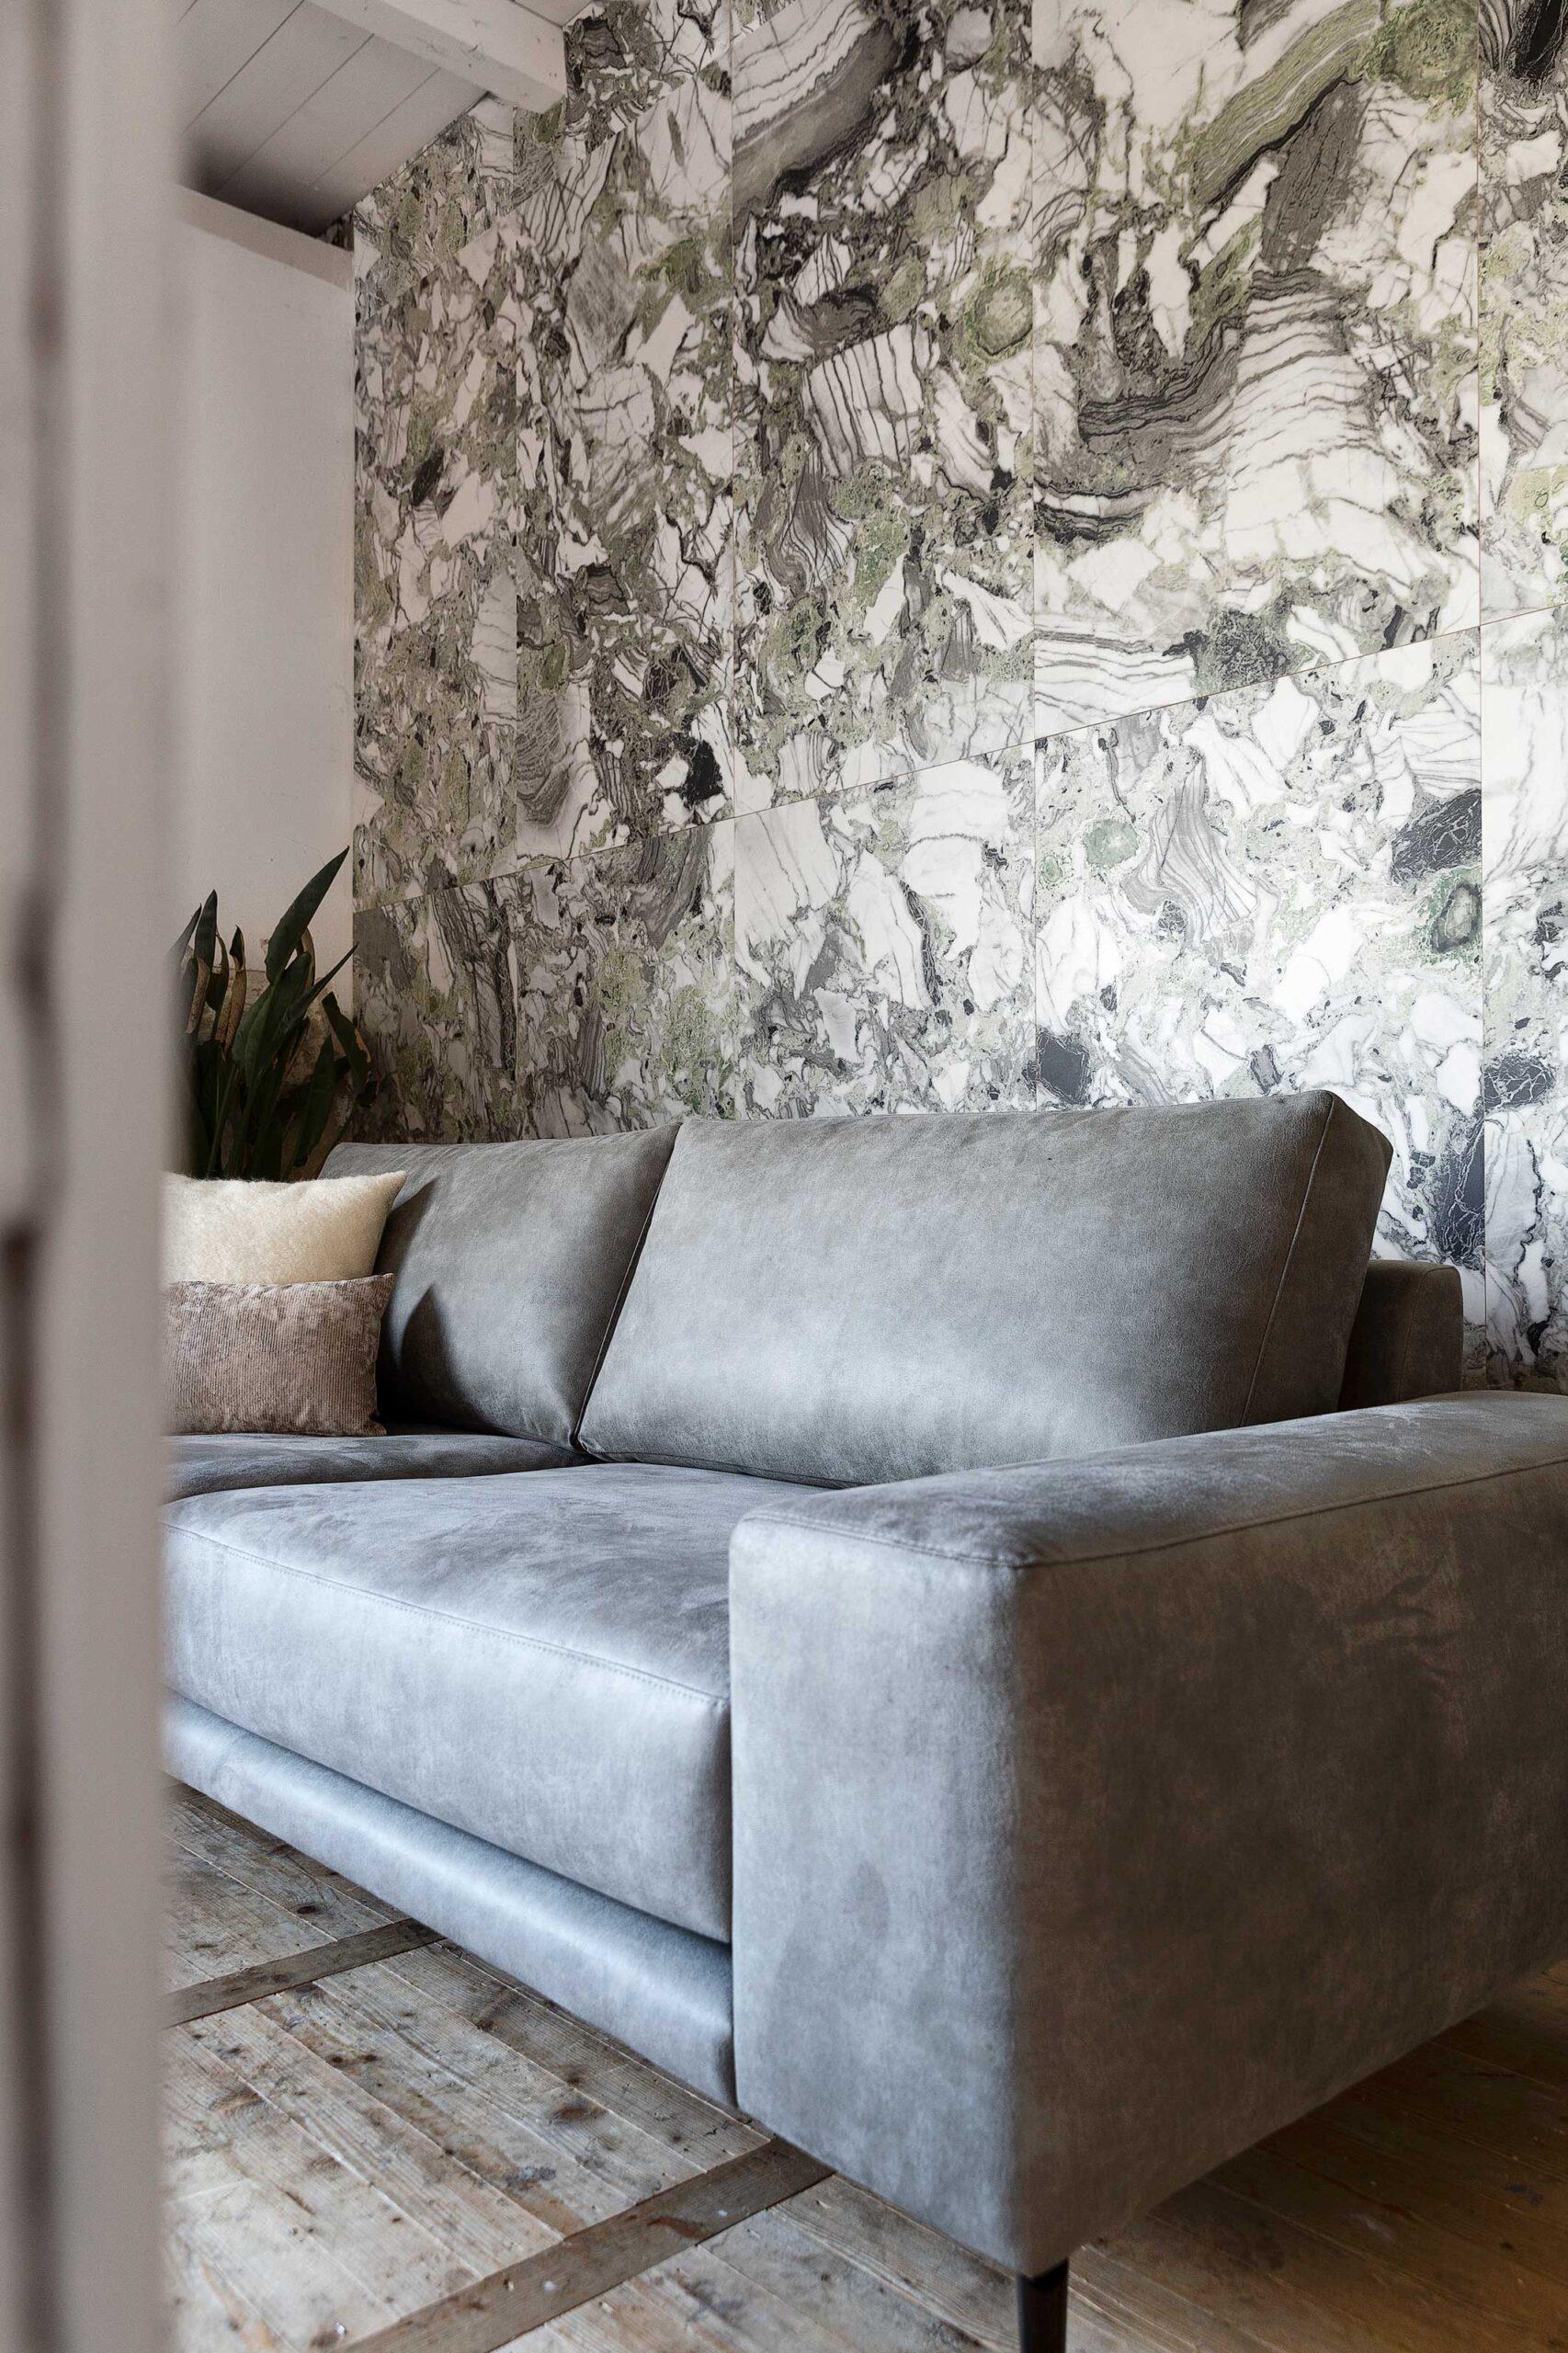 bella-milano-bankstel-modern-landelijke-uitstraling-soofs-interieur